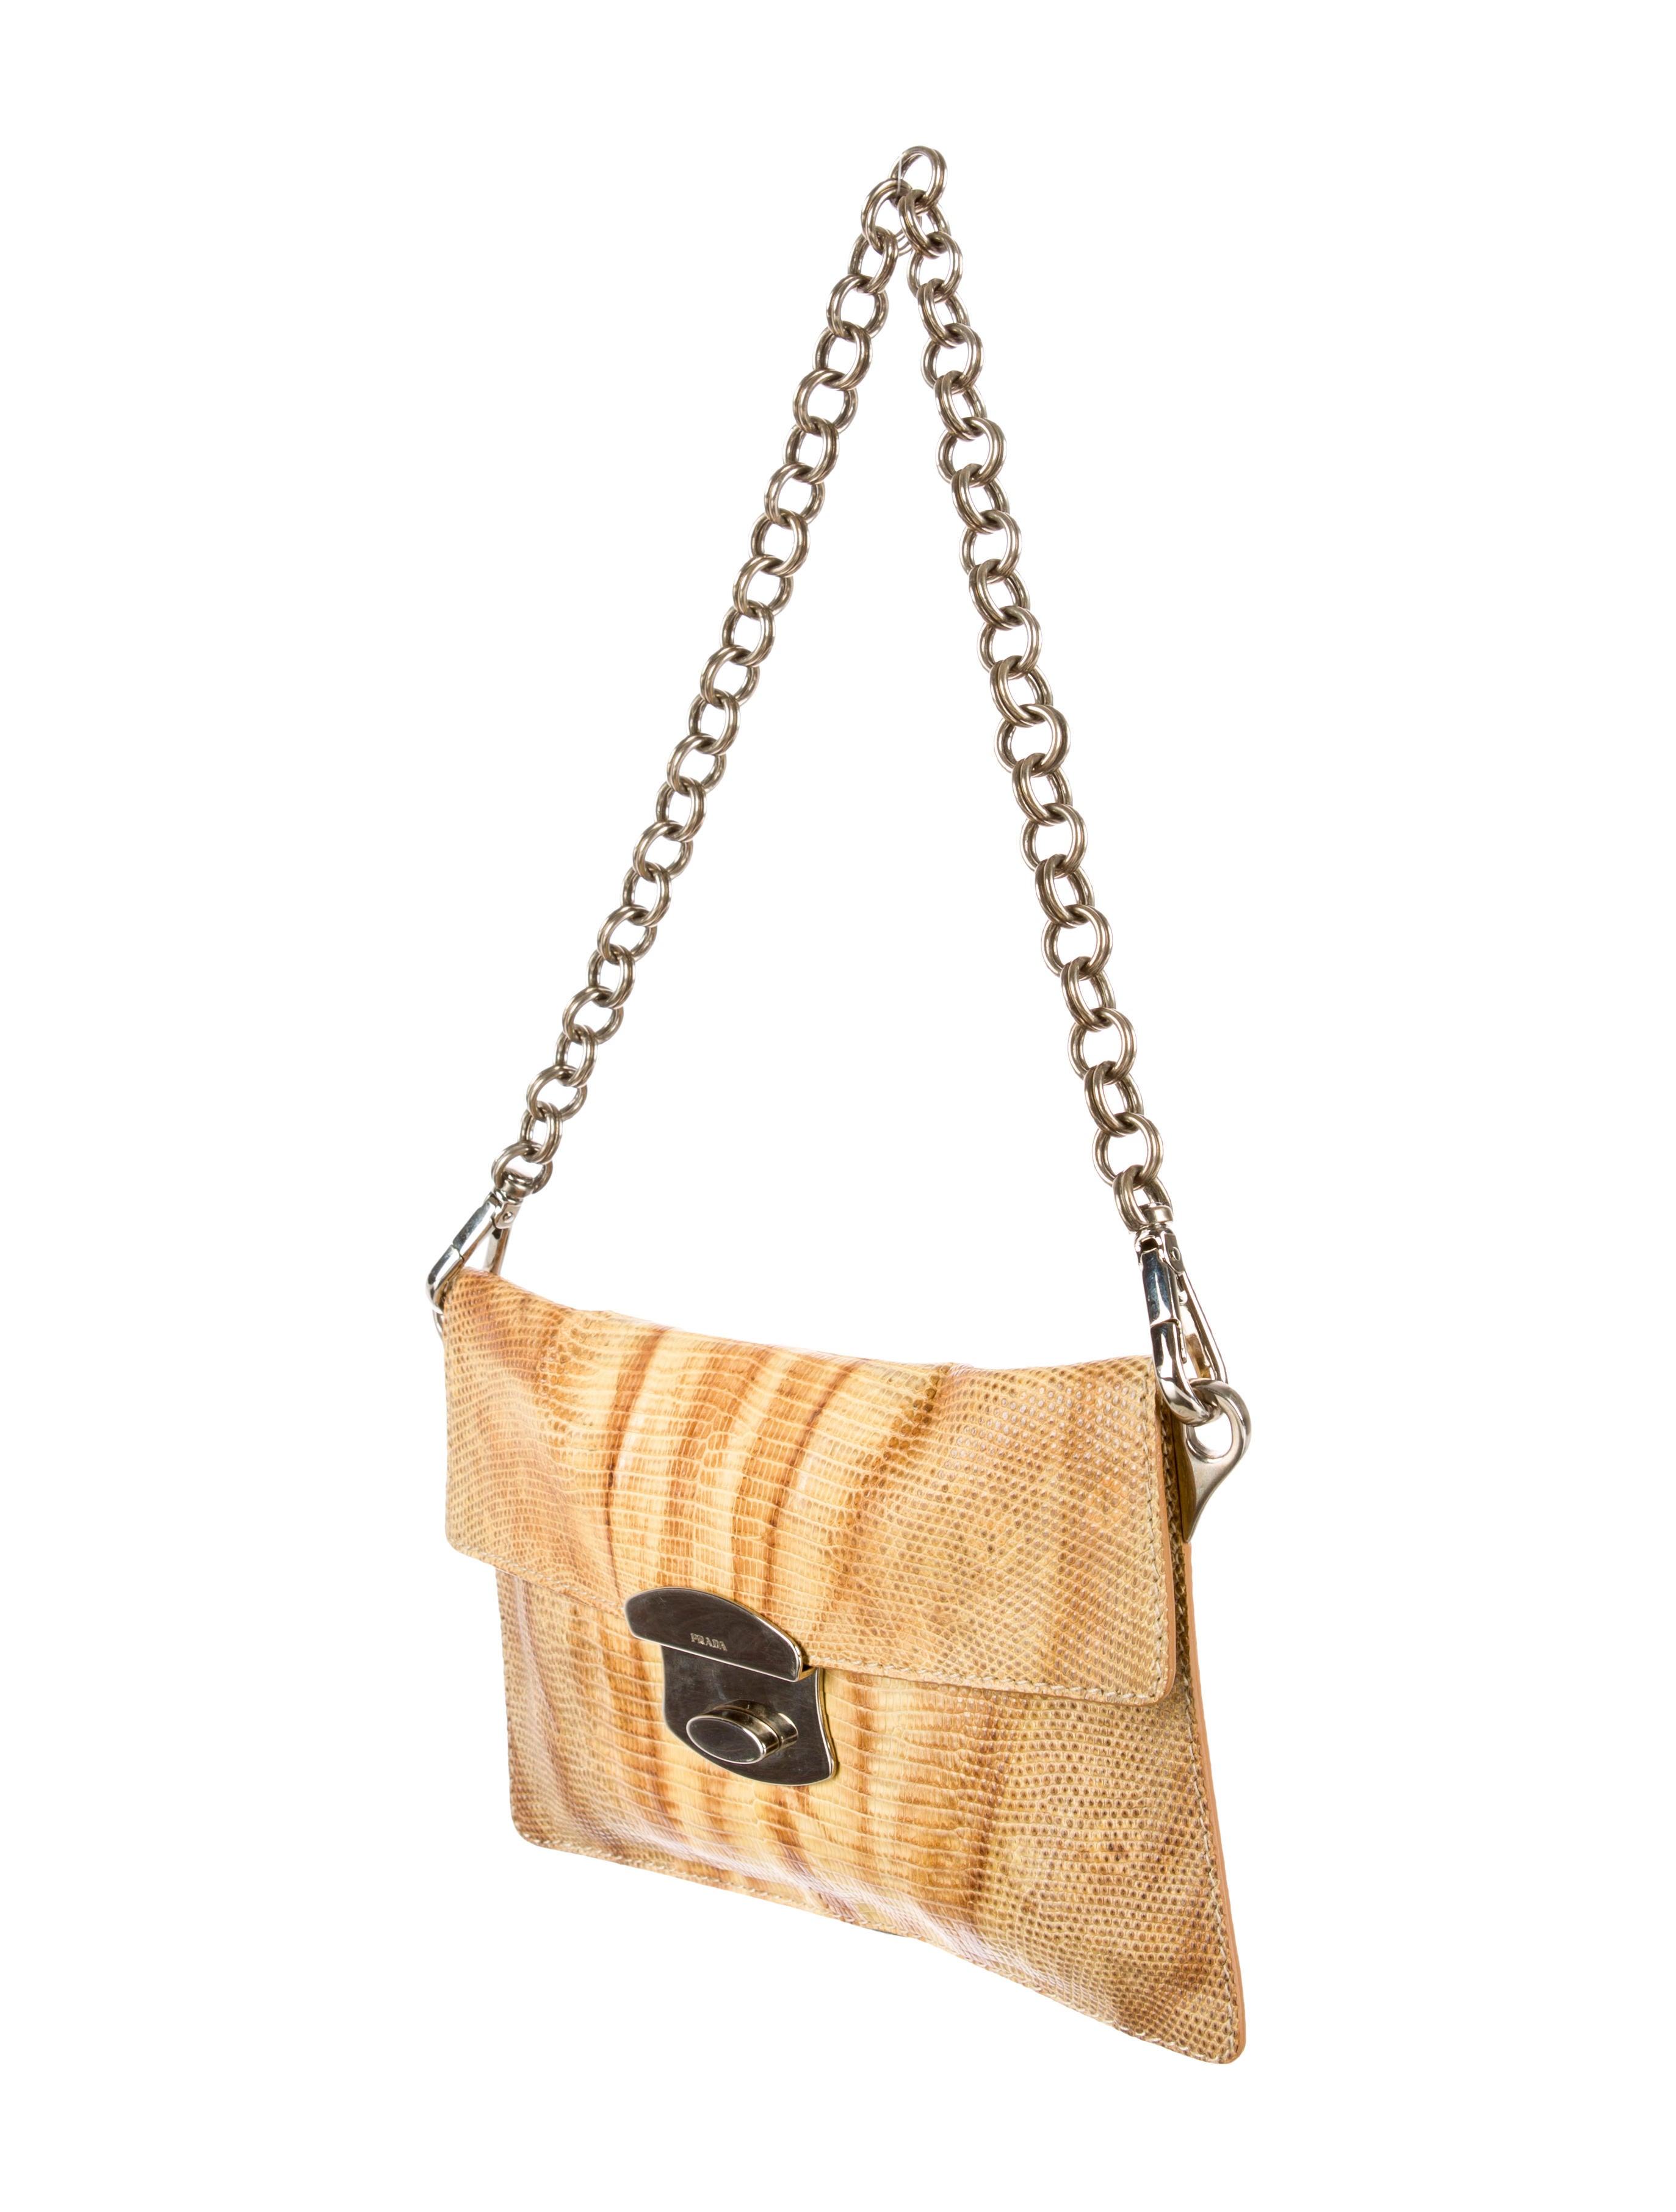 messenger basg - prada ring lizard pochette, prada designer handbags